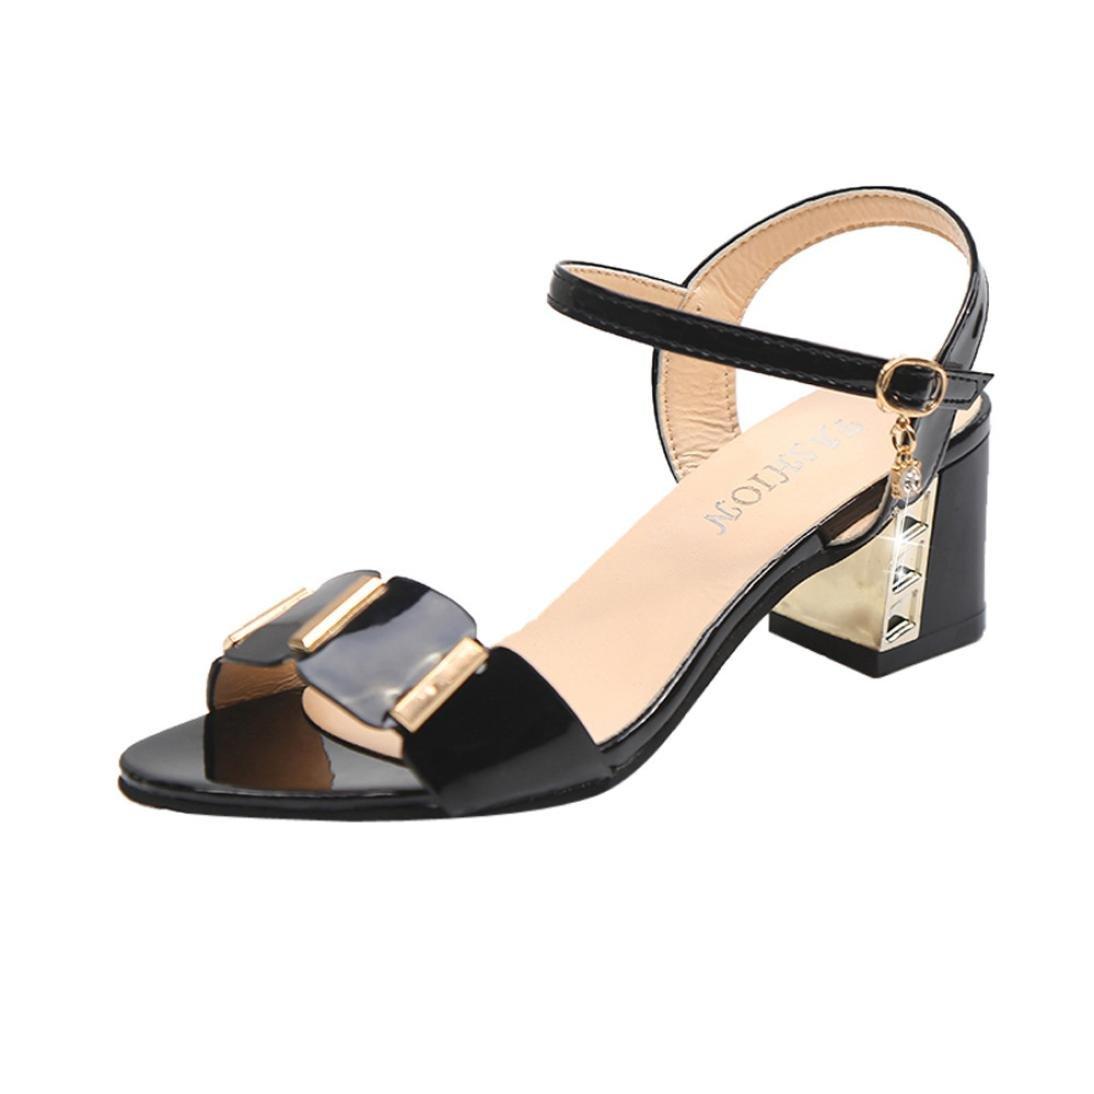 90392755d1c56e Lolittas High Block Heel Wedge Platform Sandals Shoes